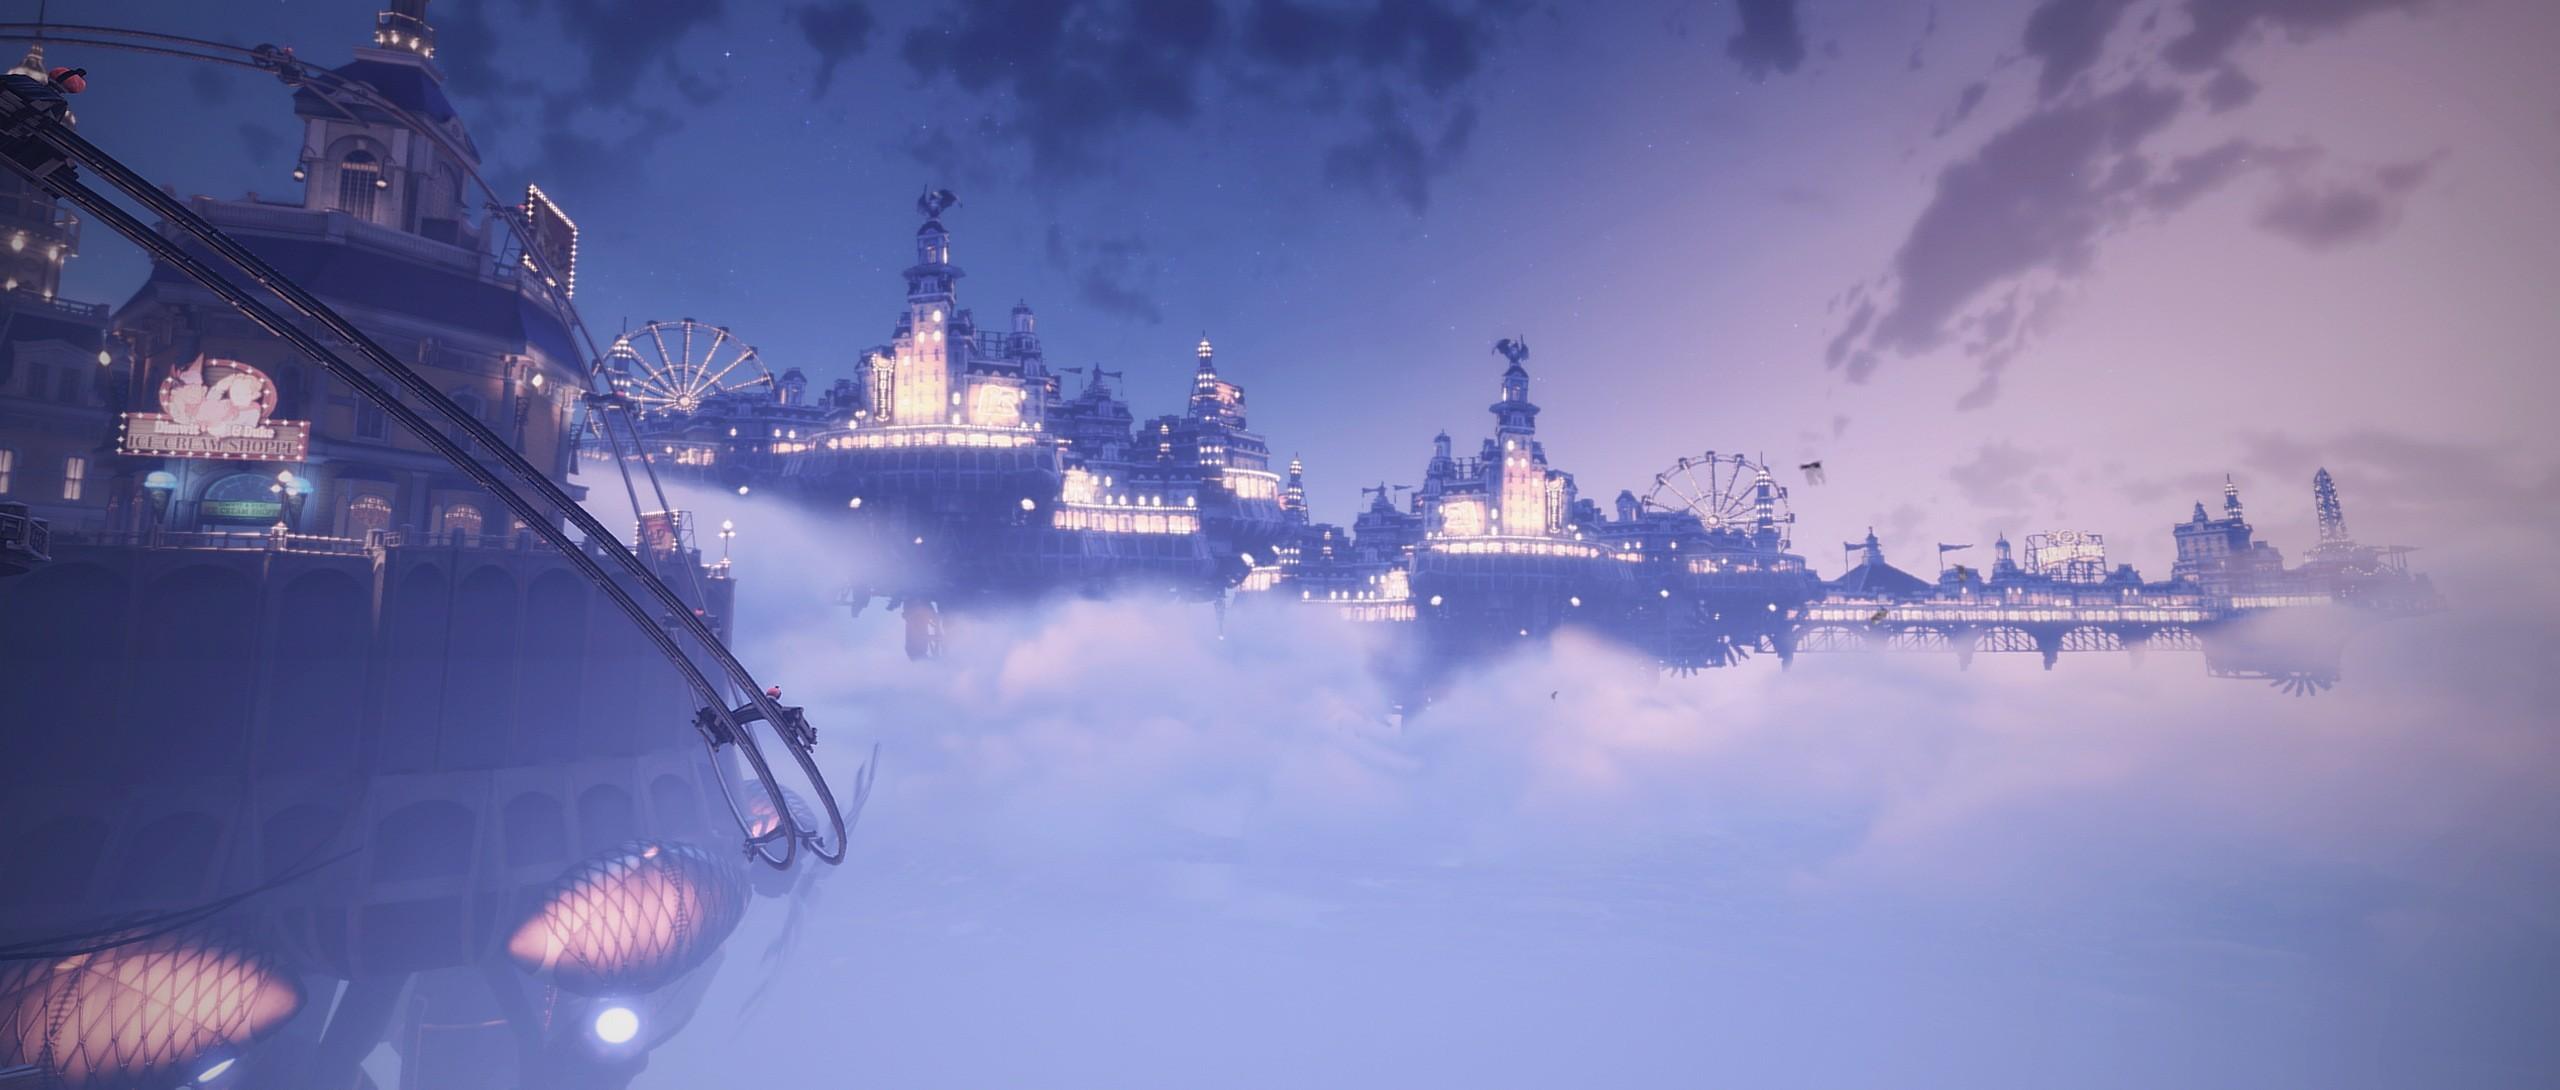 BioShock, Columbia (Bioshock), BioShock Infinite Wallpapers HD / Desktop  and Mobile Backgrounds